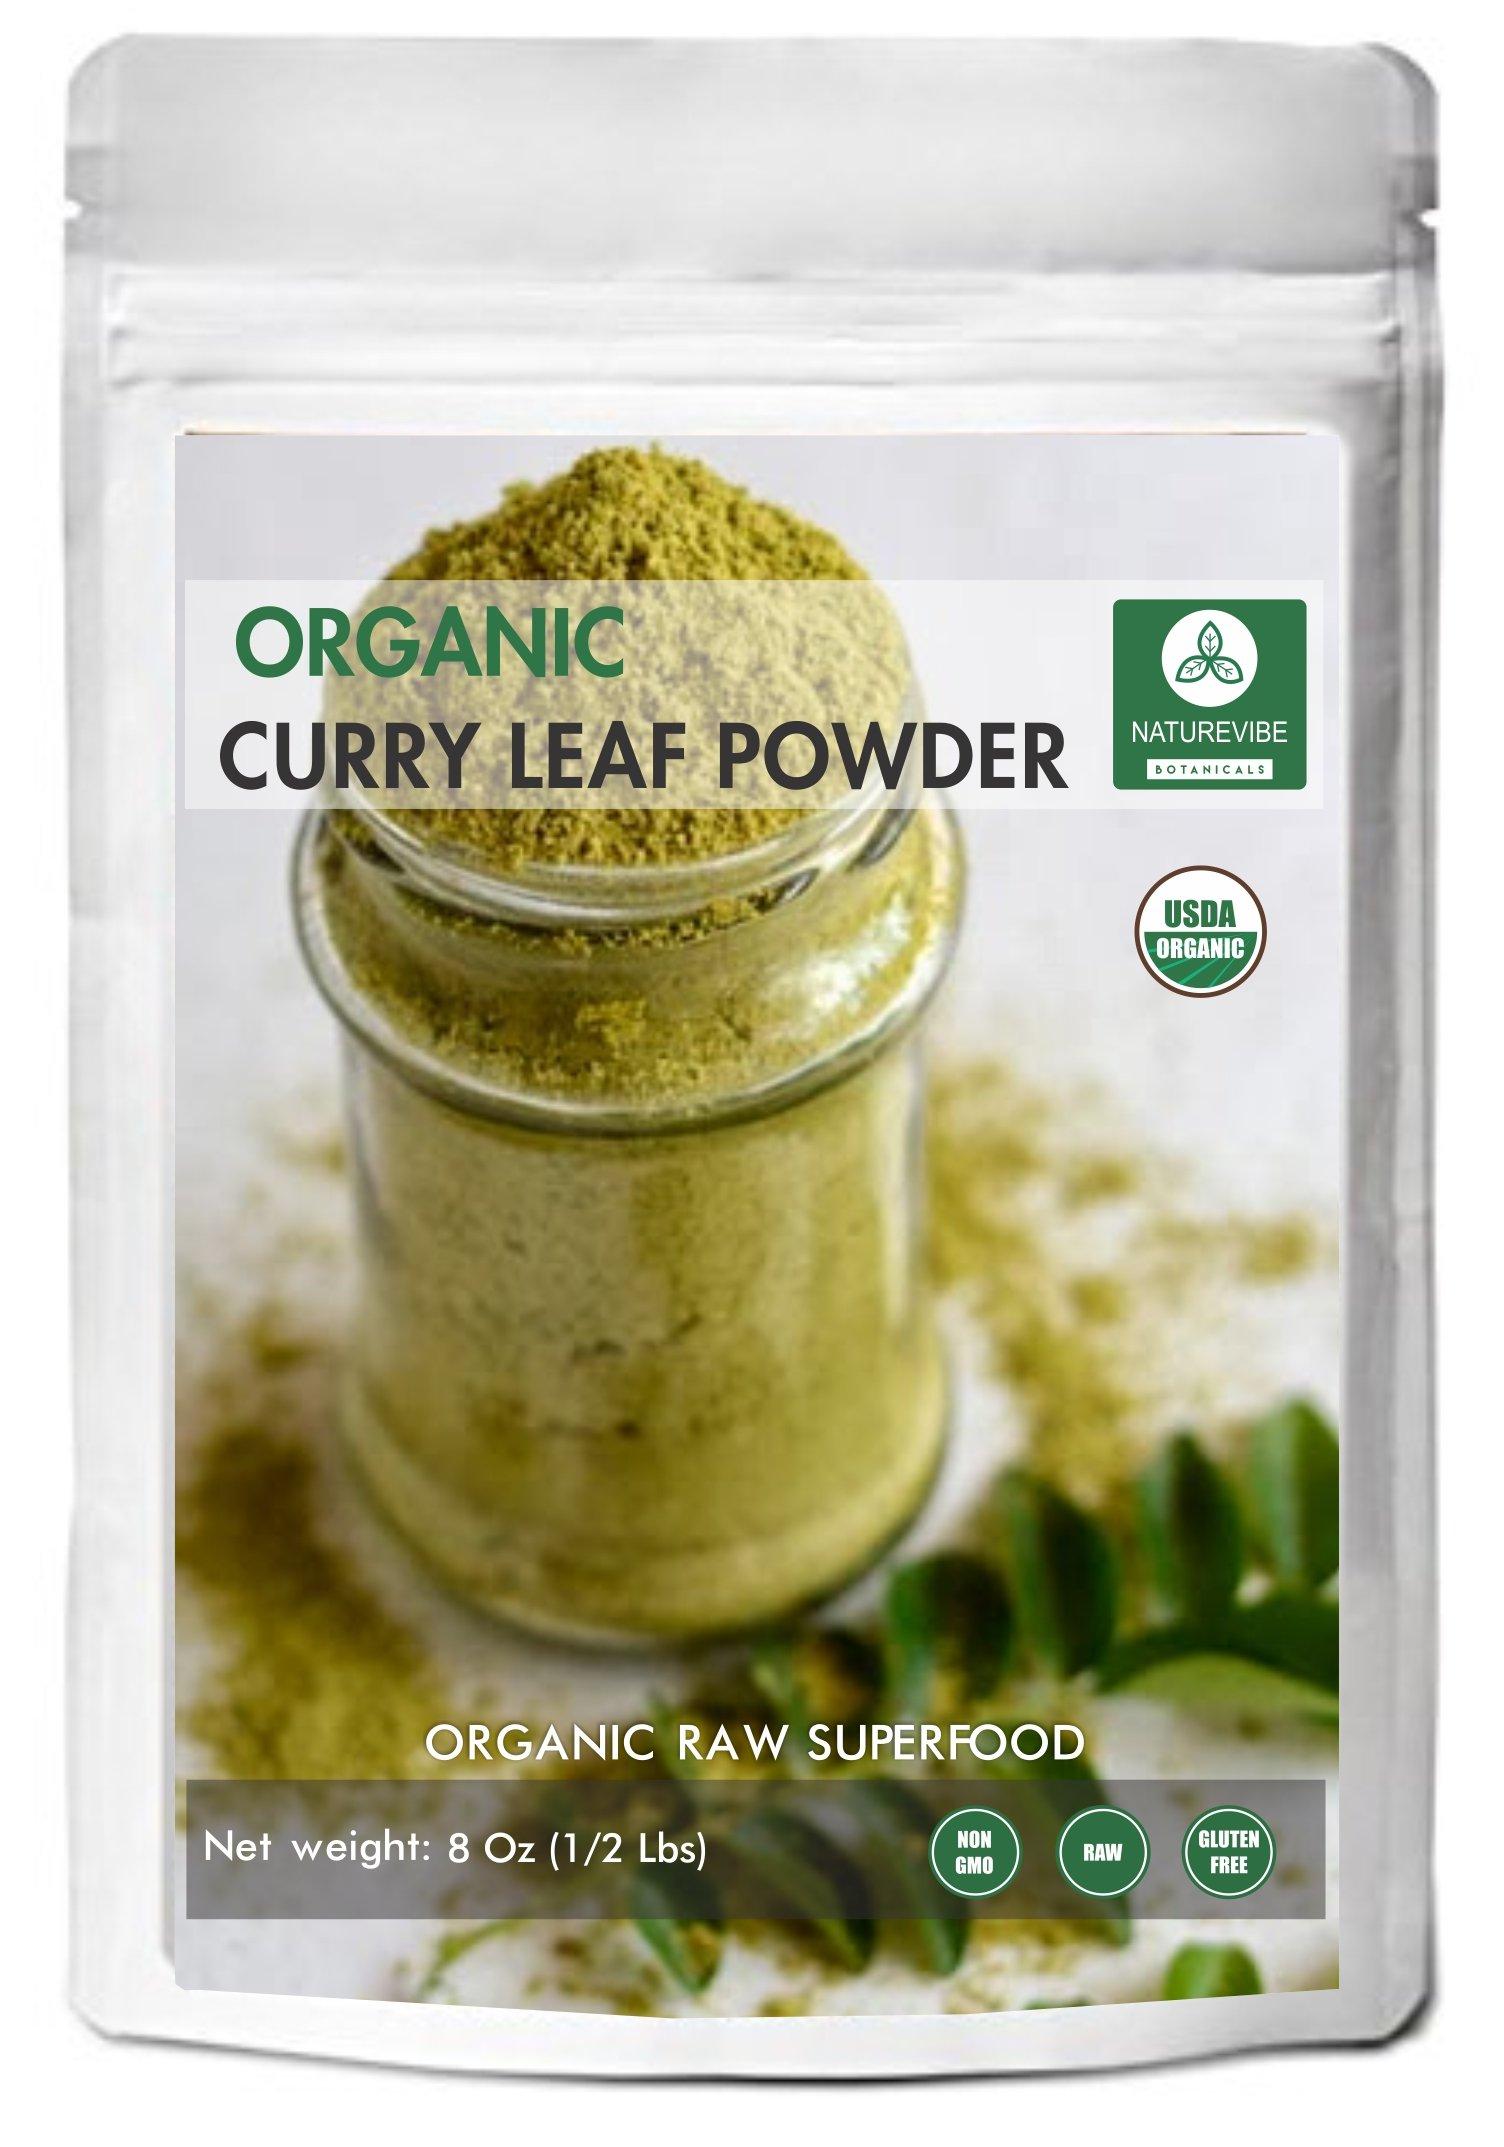 Curry Leaf Powder (1/2 lb) by Naturevibe Botanicals, Gluten-Free & Non-GMO (8 ounces) - Organic Murraya koenigii